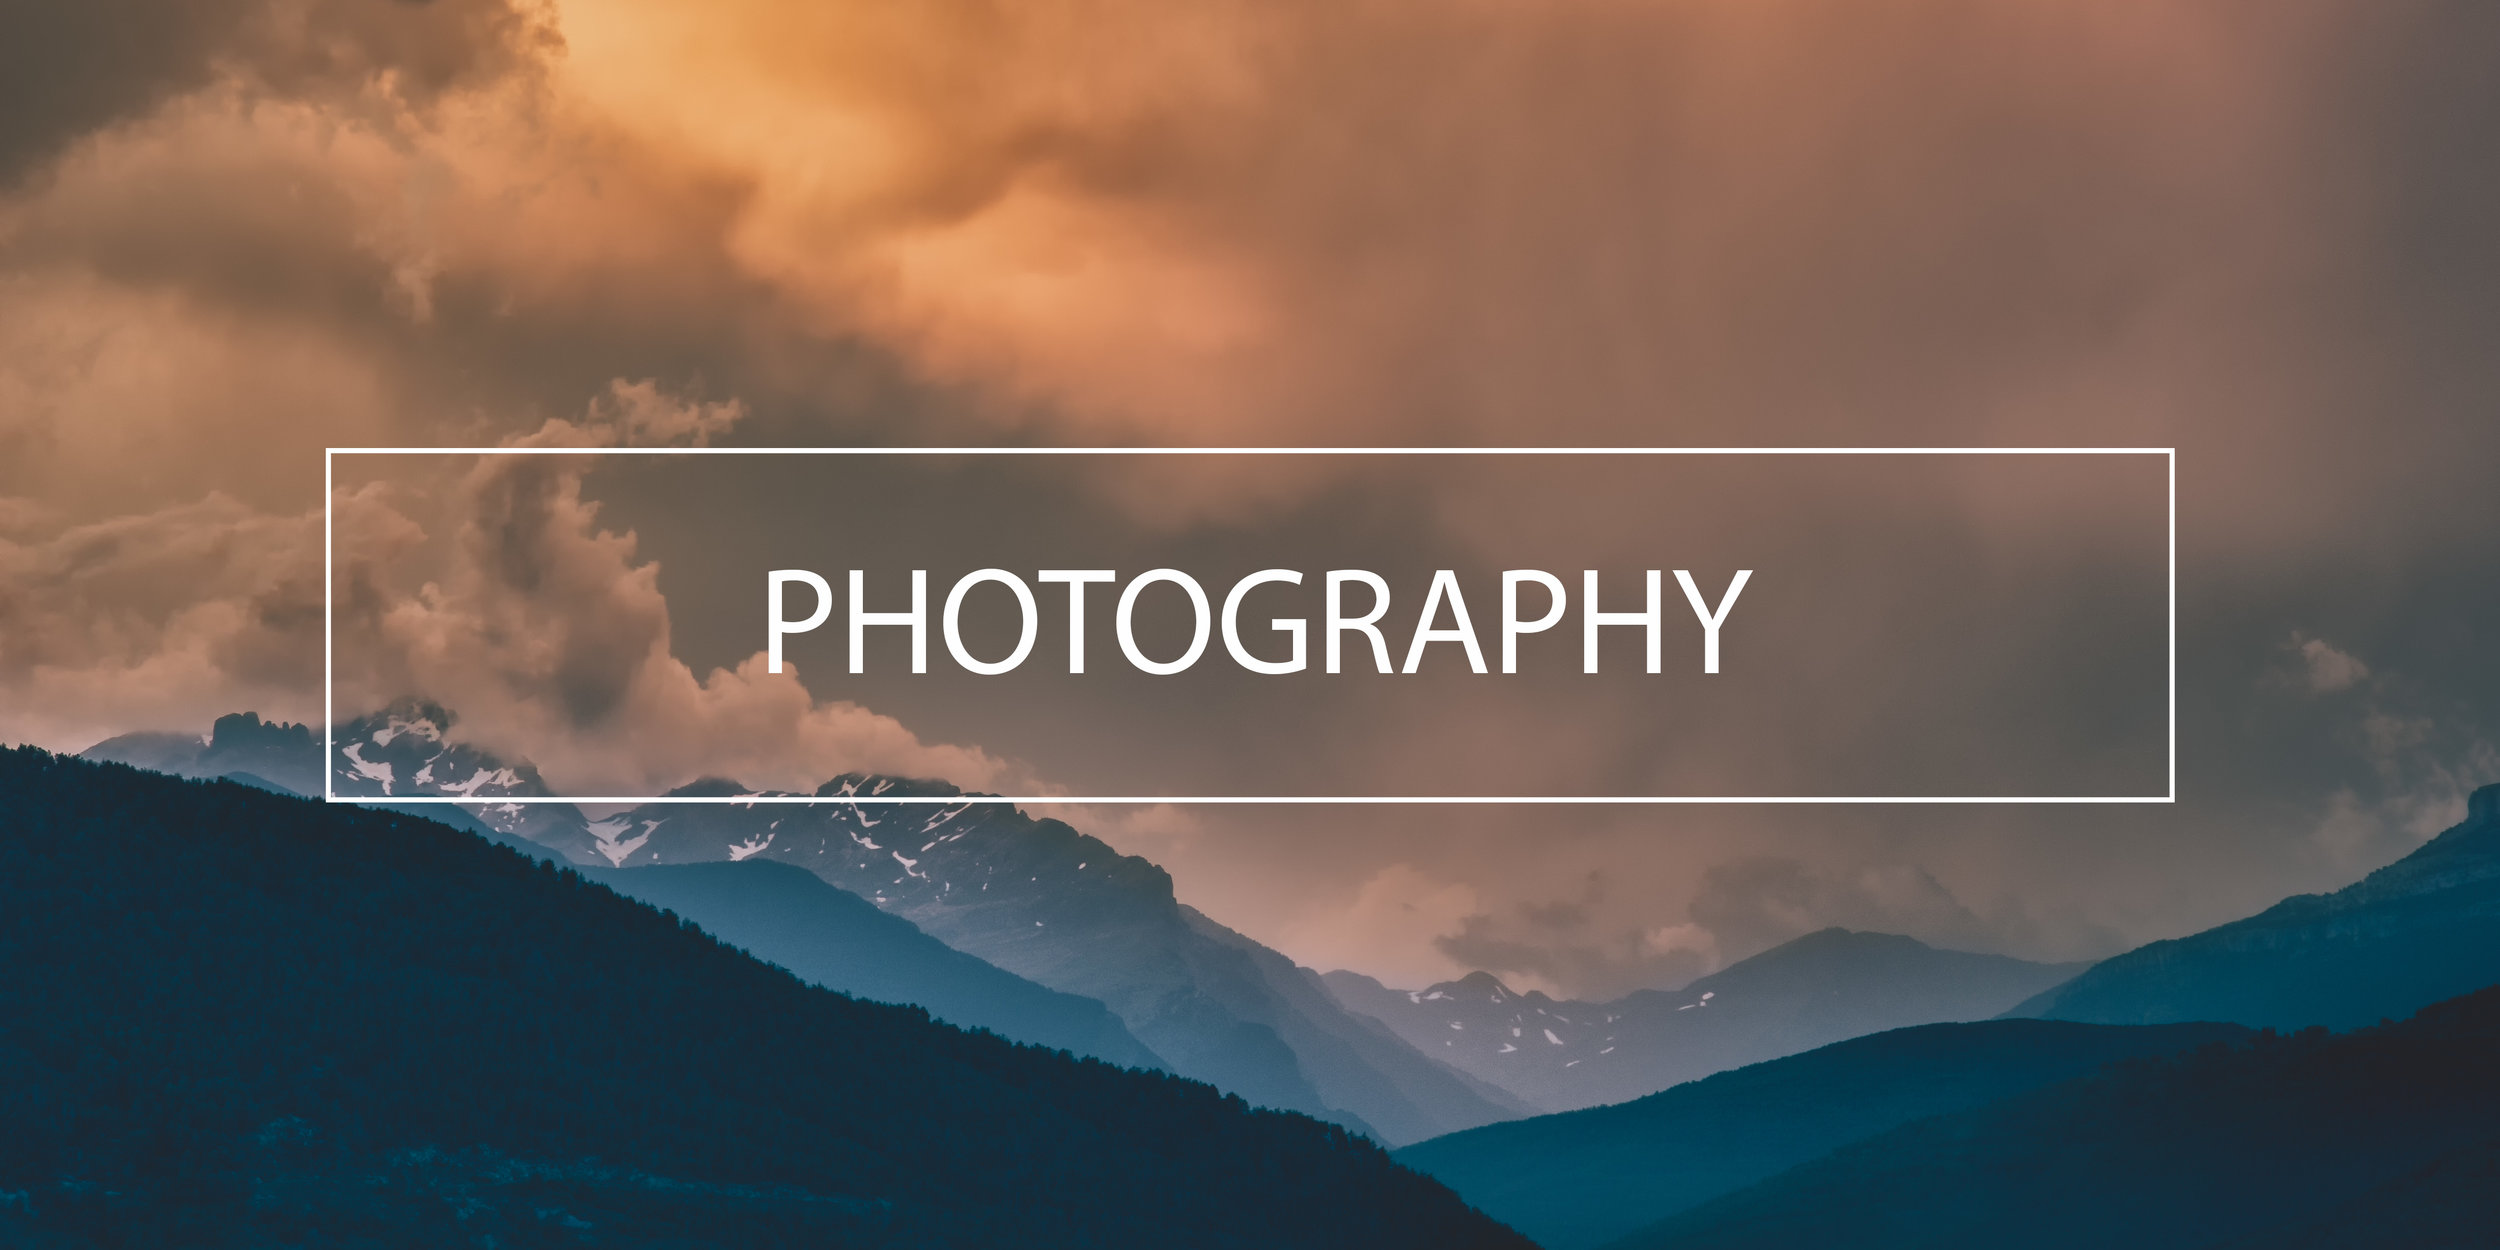 20150606_Photography-Banner-2.jpg